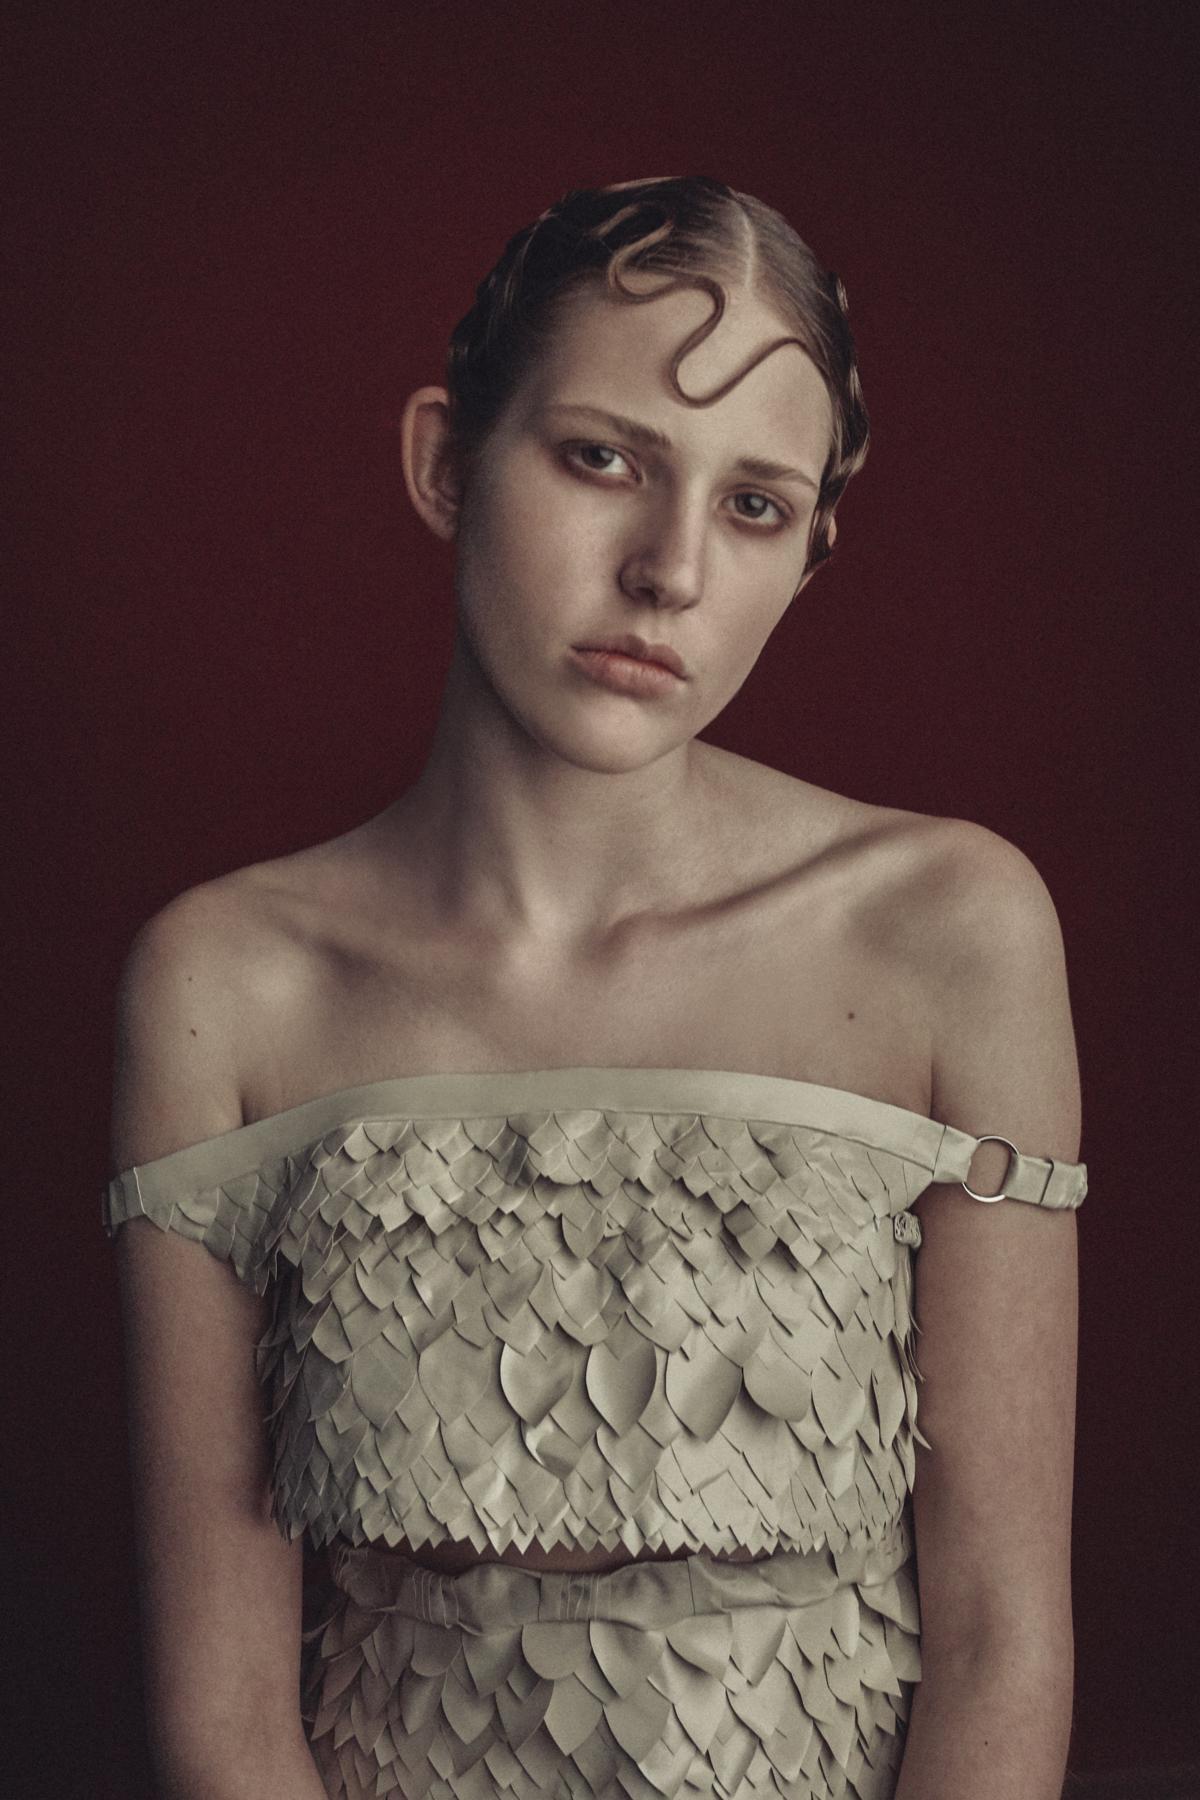 Web_Lianna_Hecht_Fotografie_Emma_Anna_kea_models_16.JPG